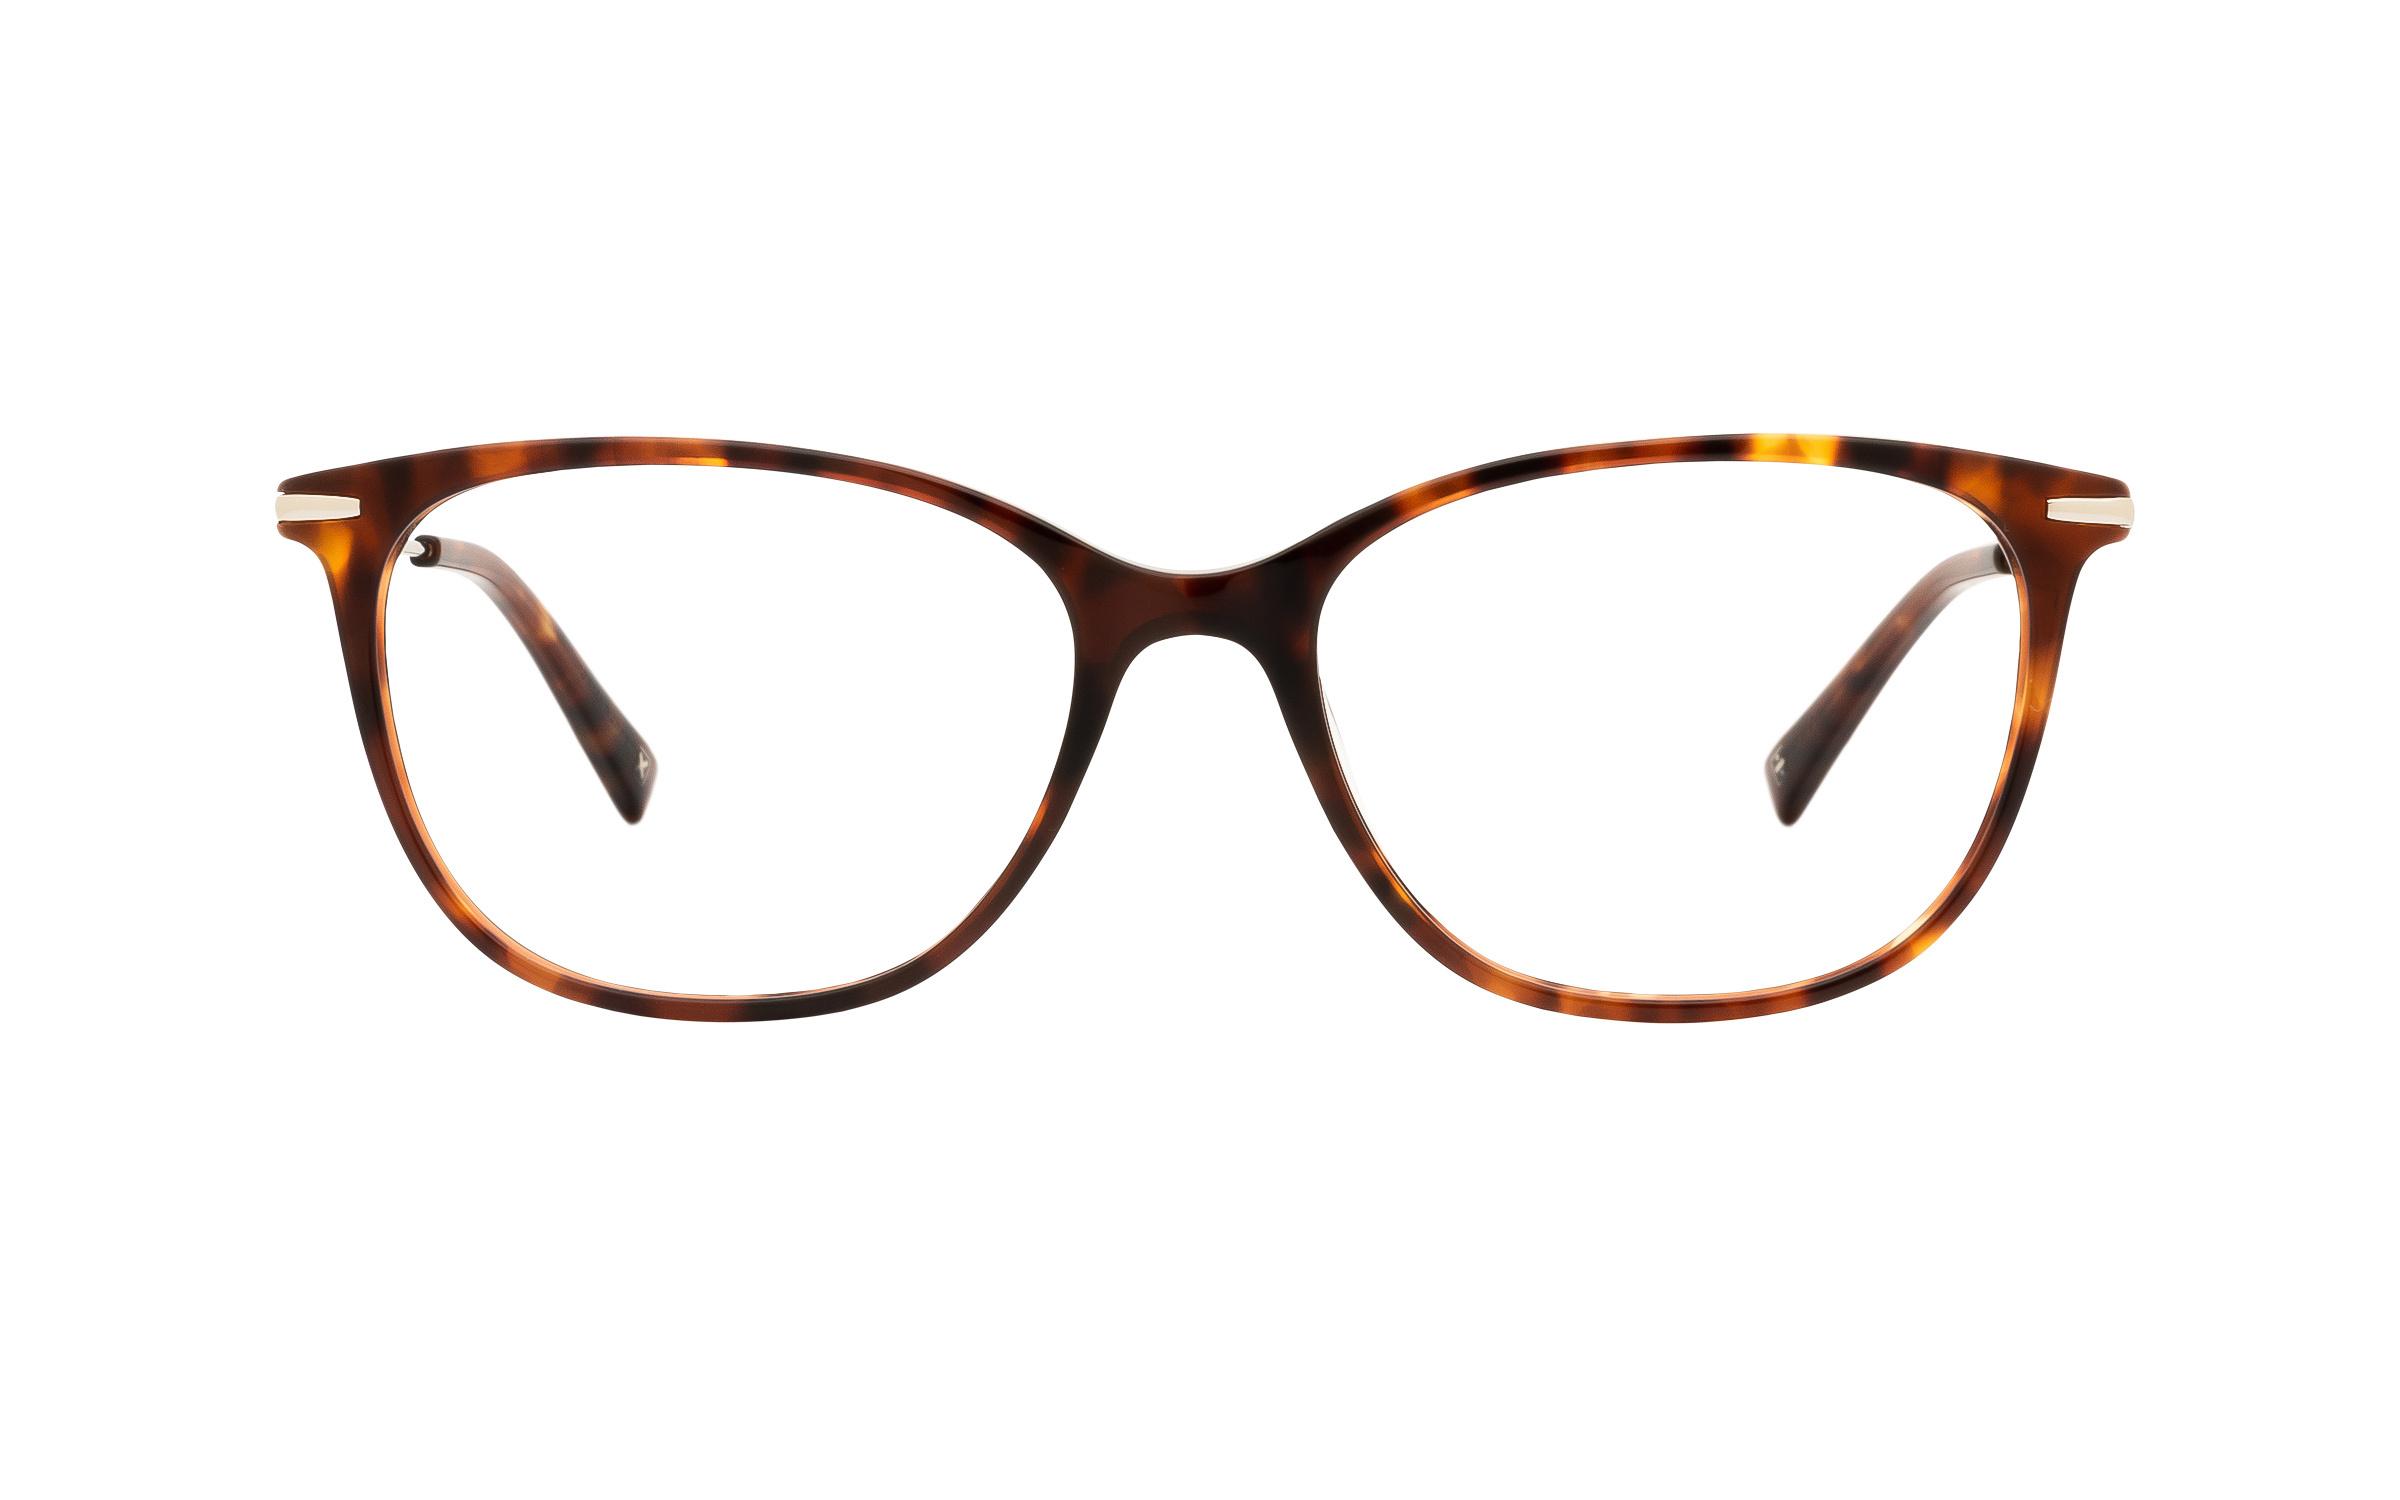 Derek Cardigan Pyxis DC230 C04 (52) Eyeglasses and Frame in Shiny Havana Tortoise | Acetate - Online